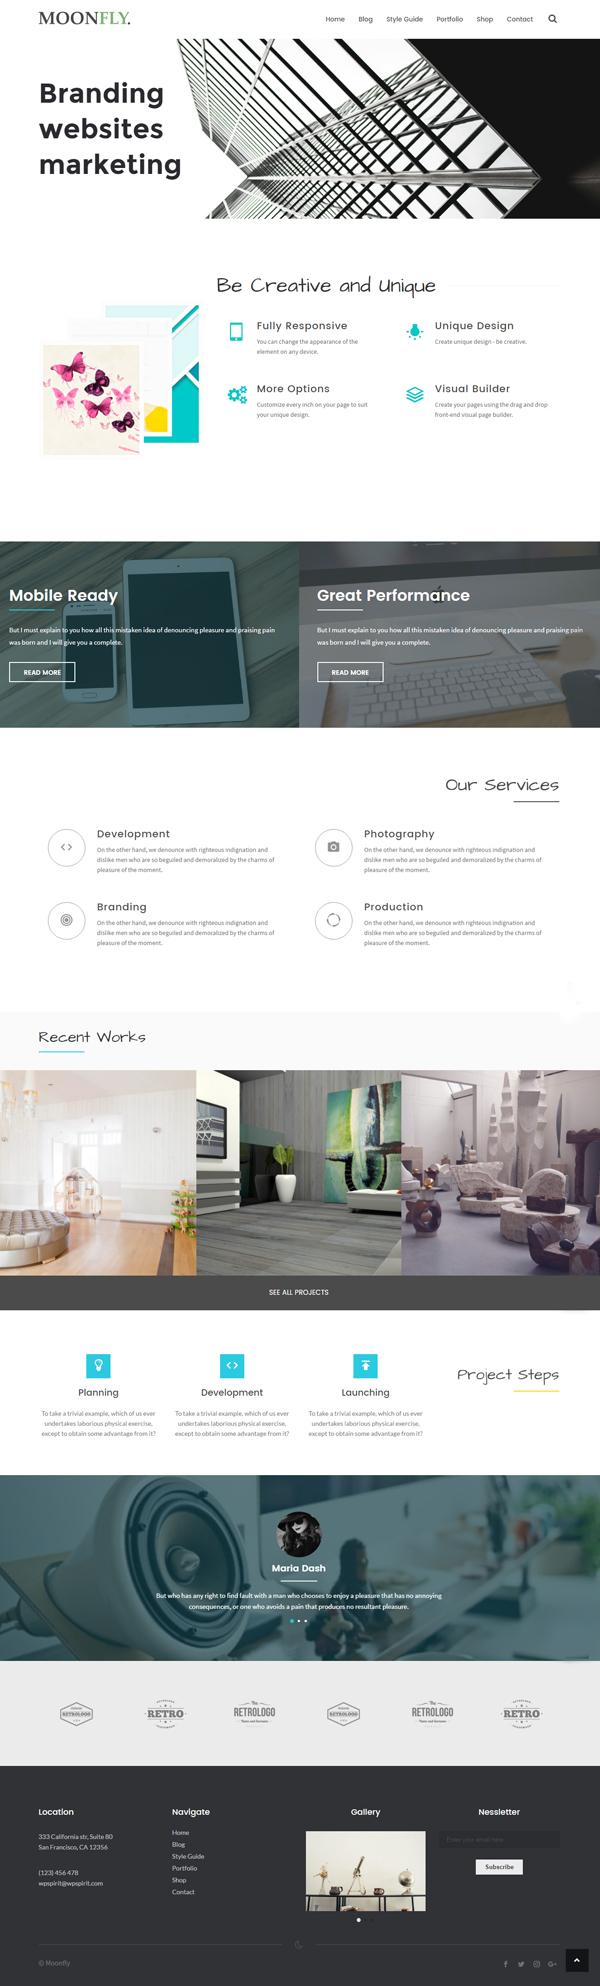 Moonfly - Multipurpose WordPress Theme